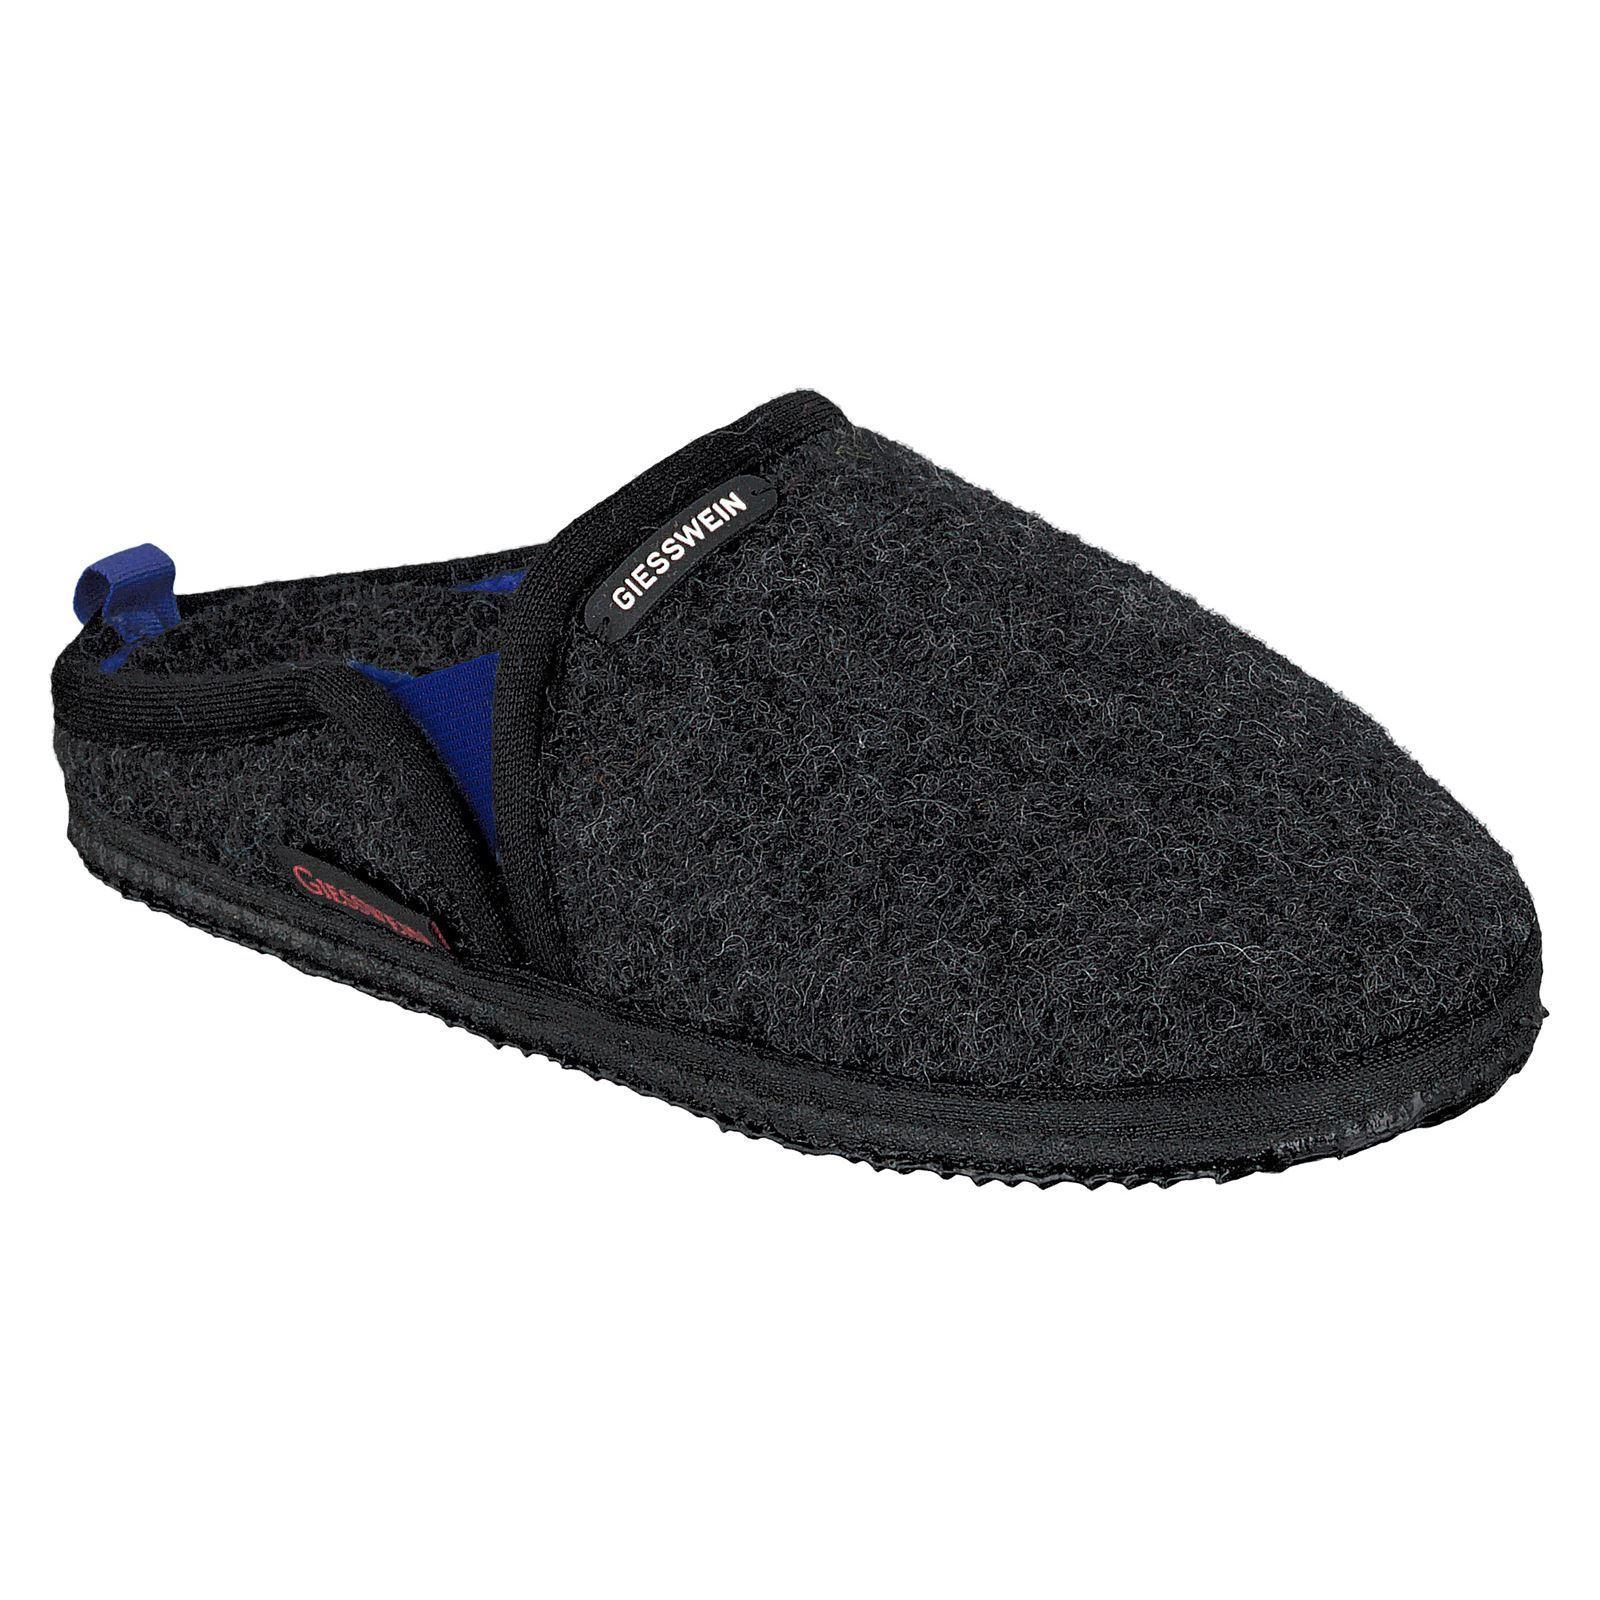 Giesswein Nieden Anthracite Damenschuhe Wool Open Mules Back Slide Schuhes Slippers Mules Open 5233cf